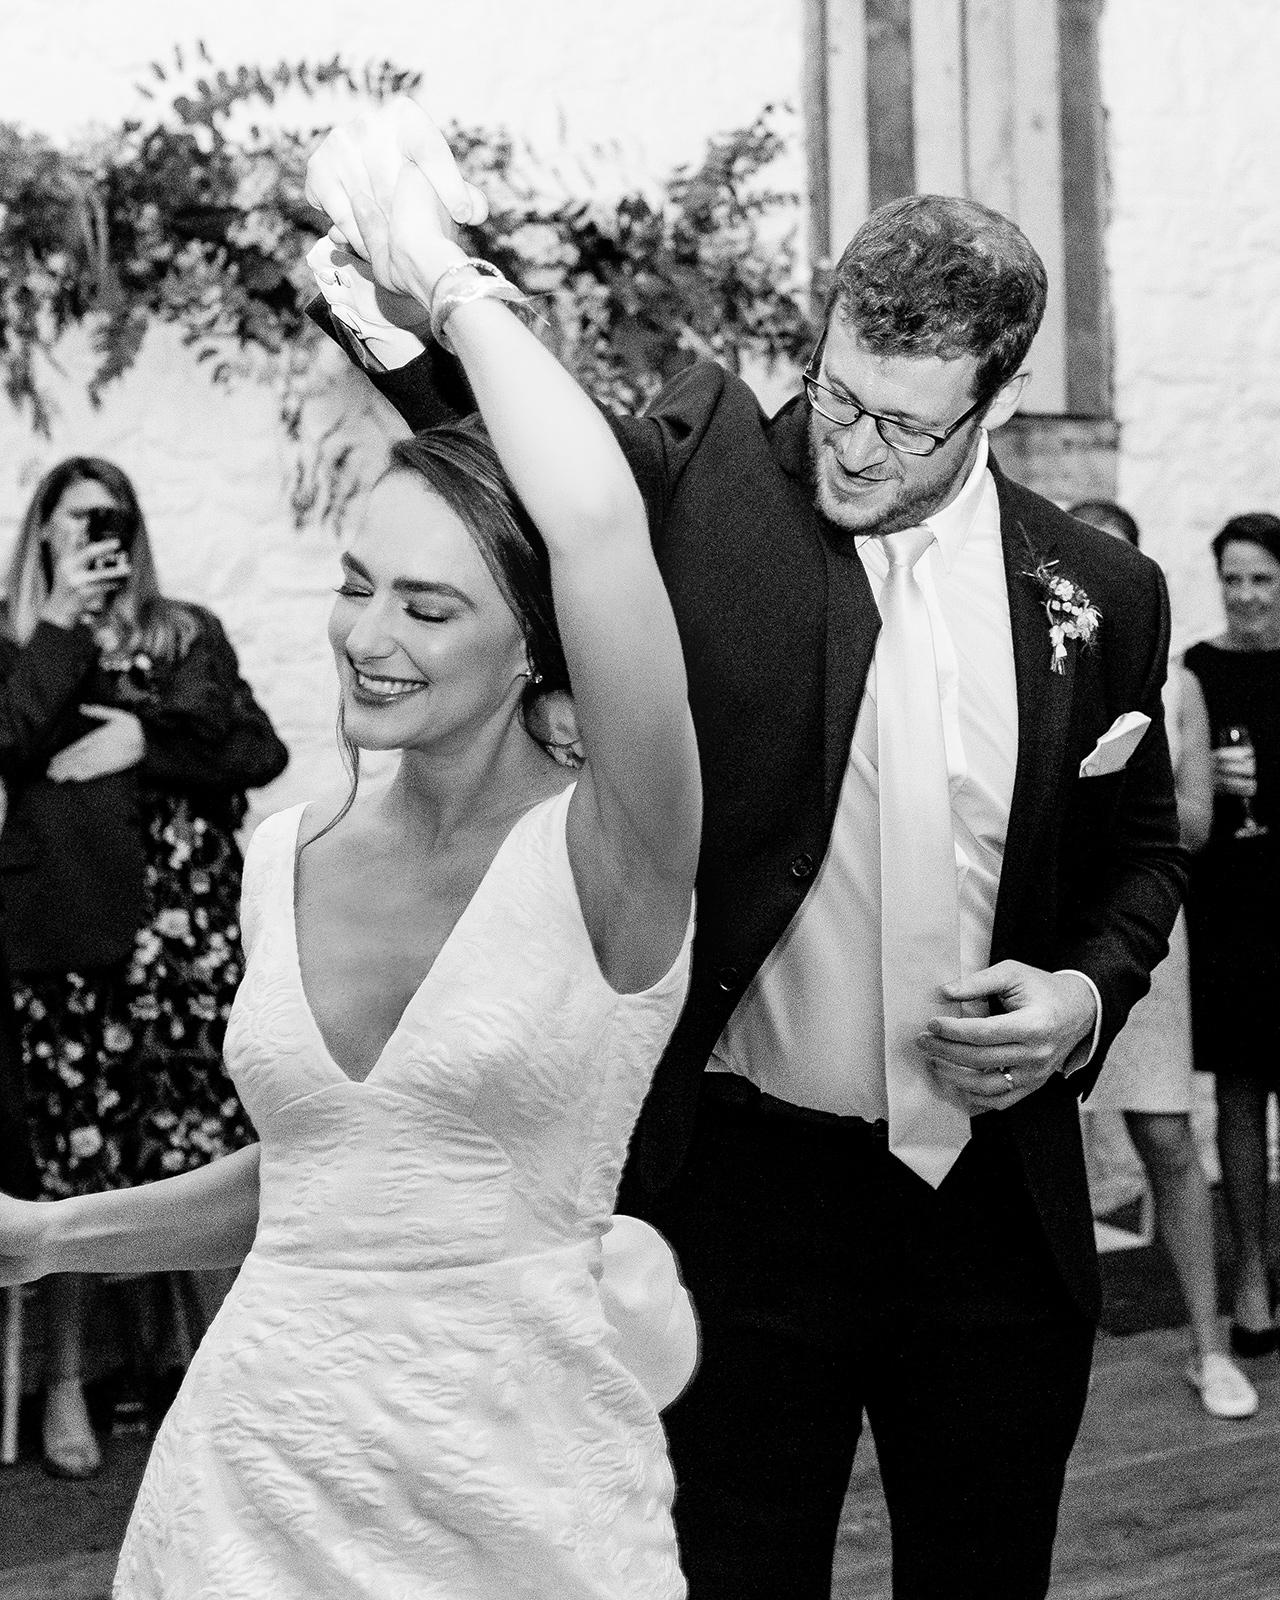 bride groom wedding reception dance twirl